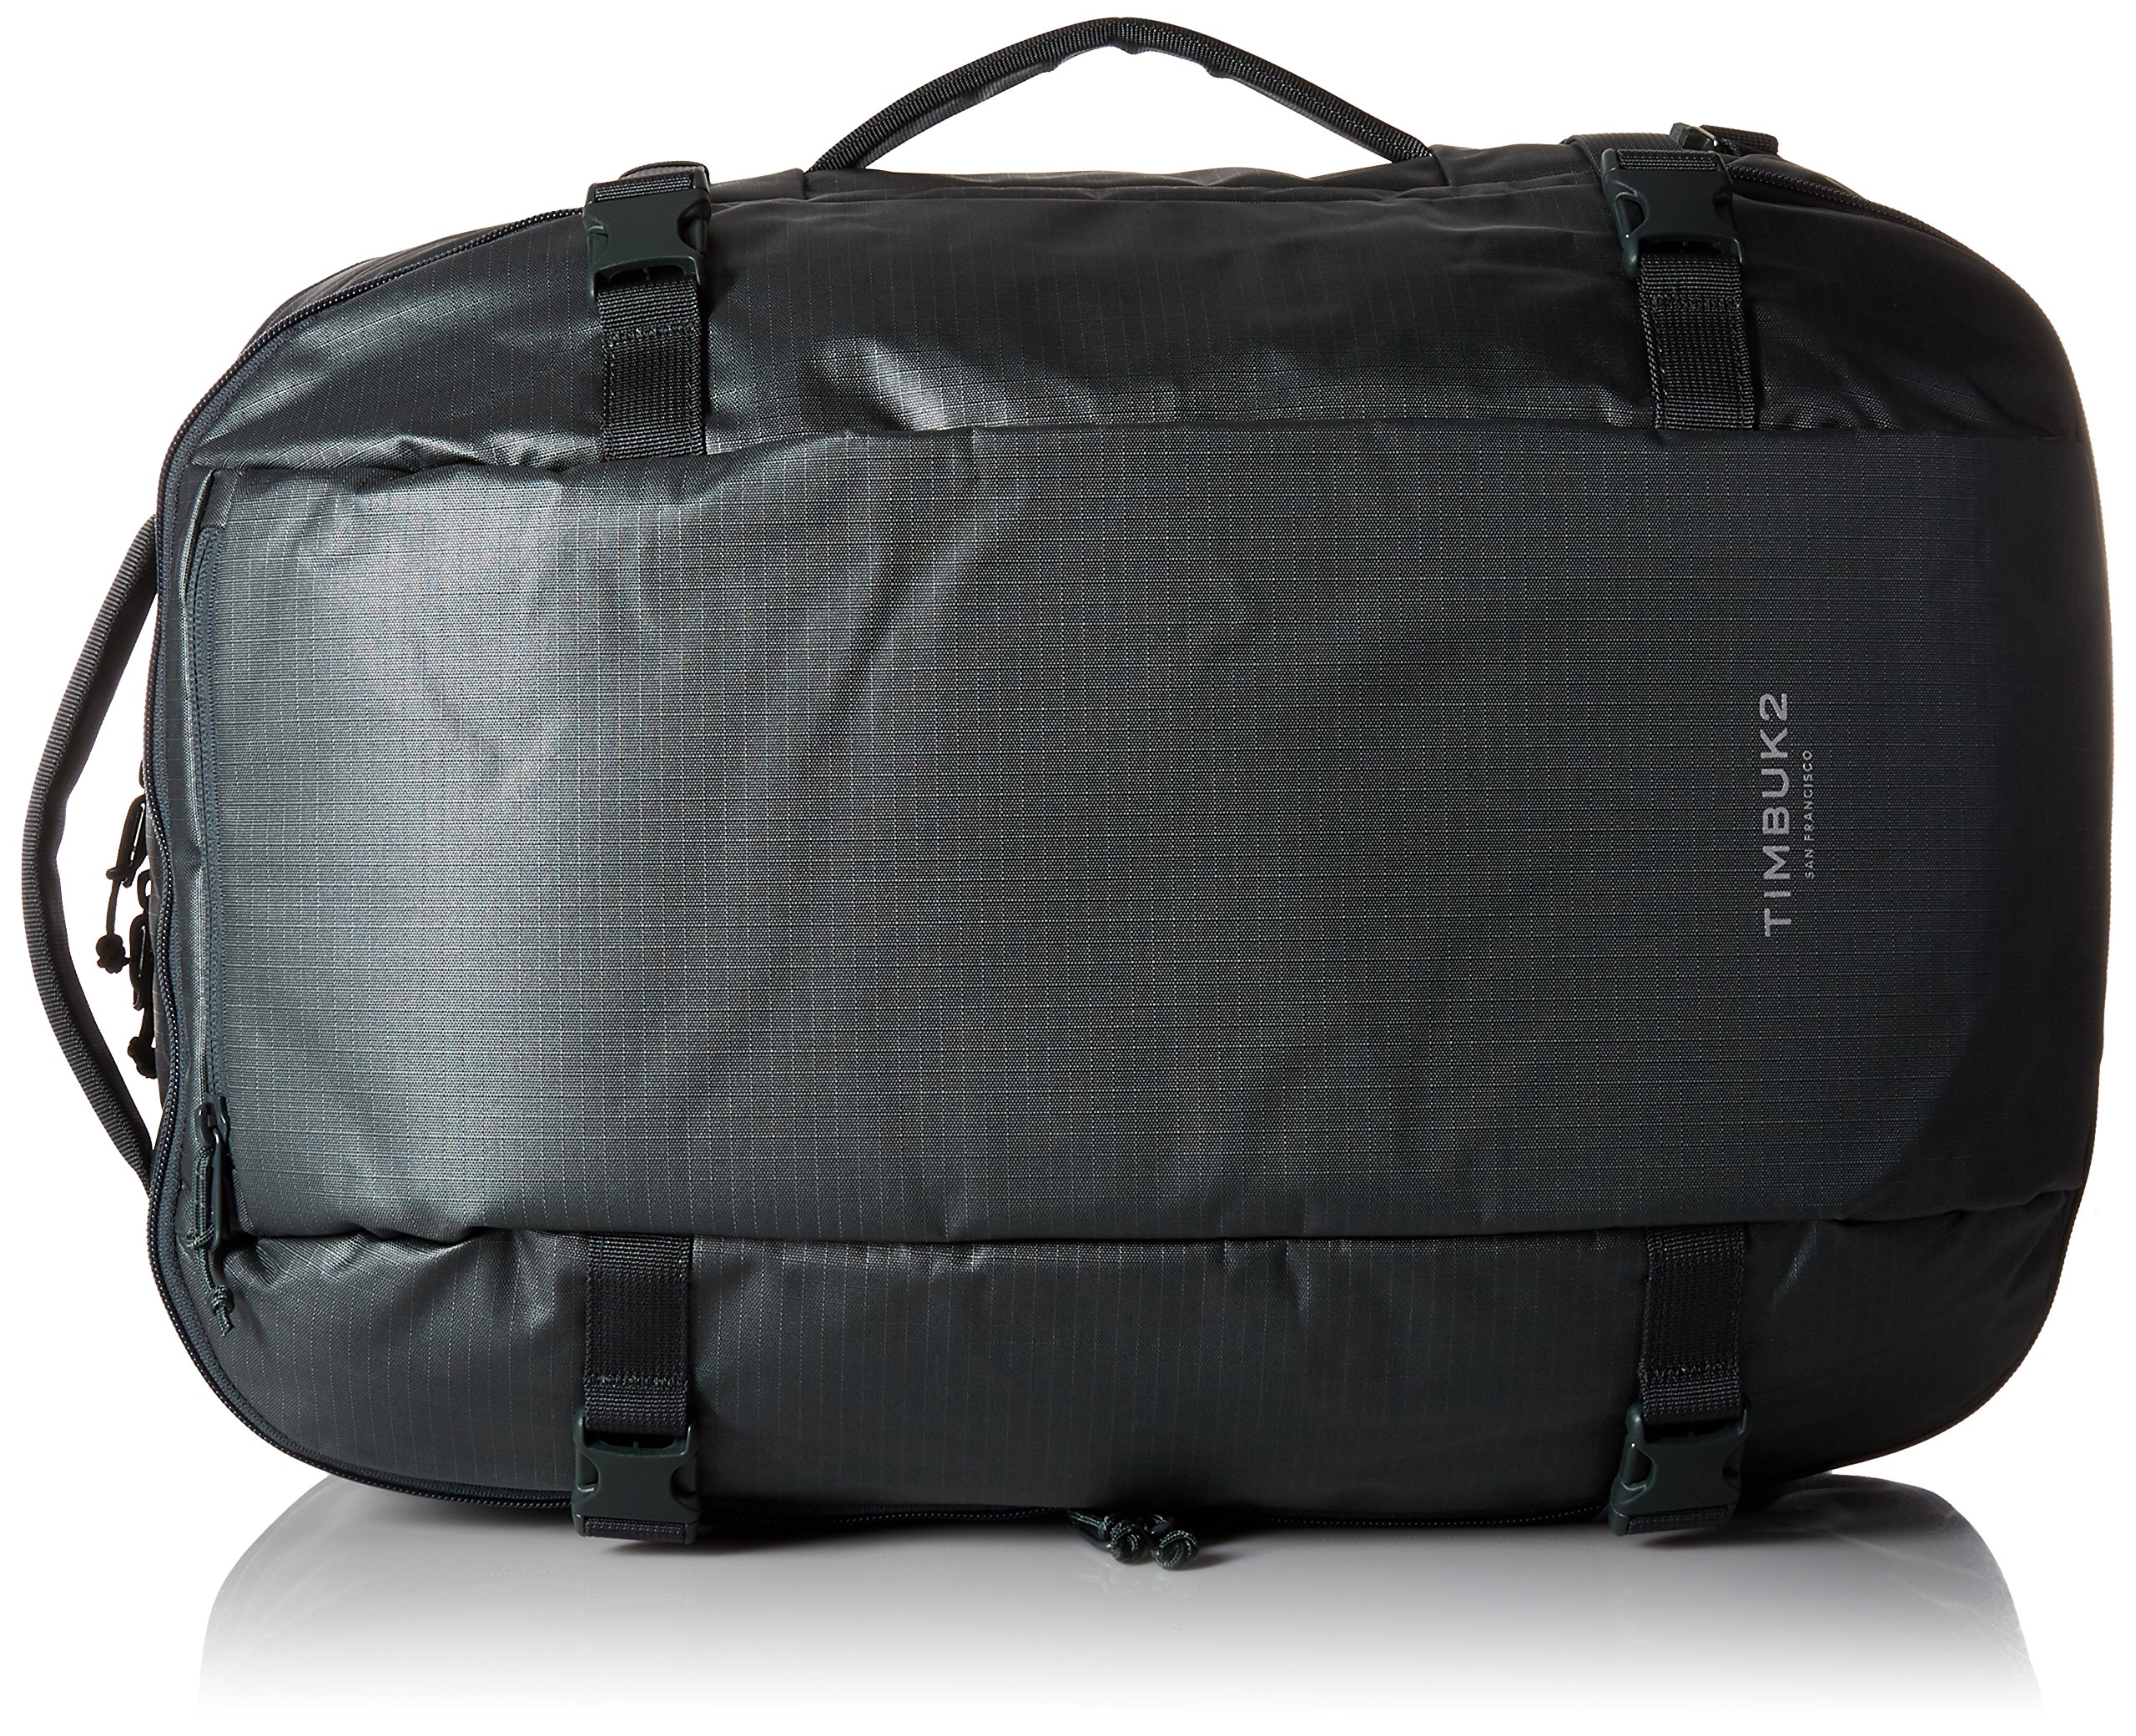 Timbuk2 Blitz Pack, OS, Surplus, One Size by Timbuk2